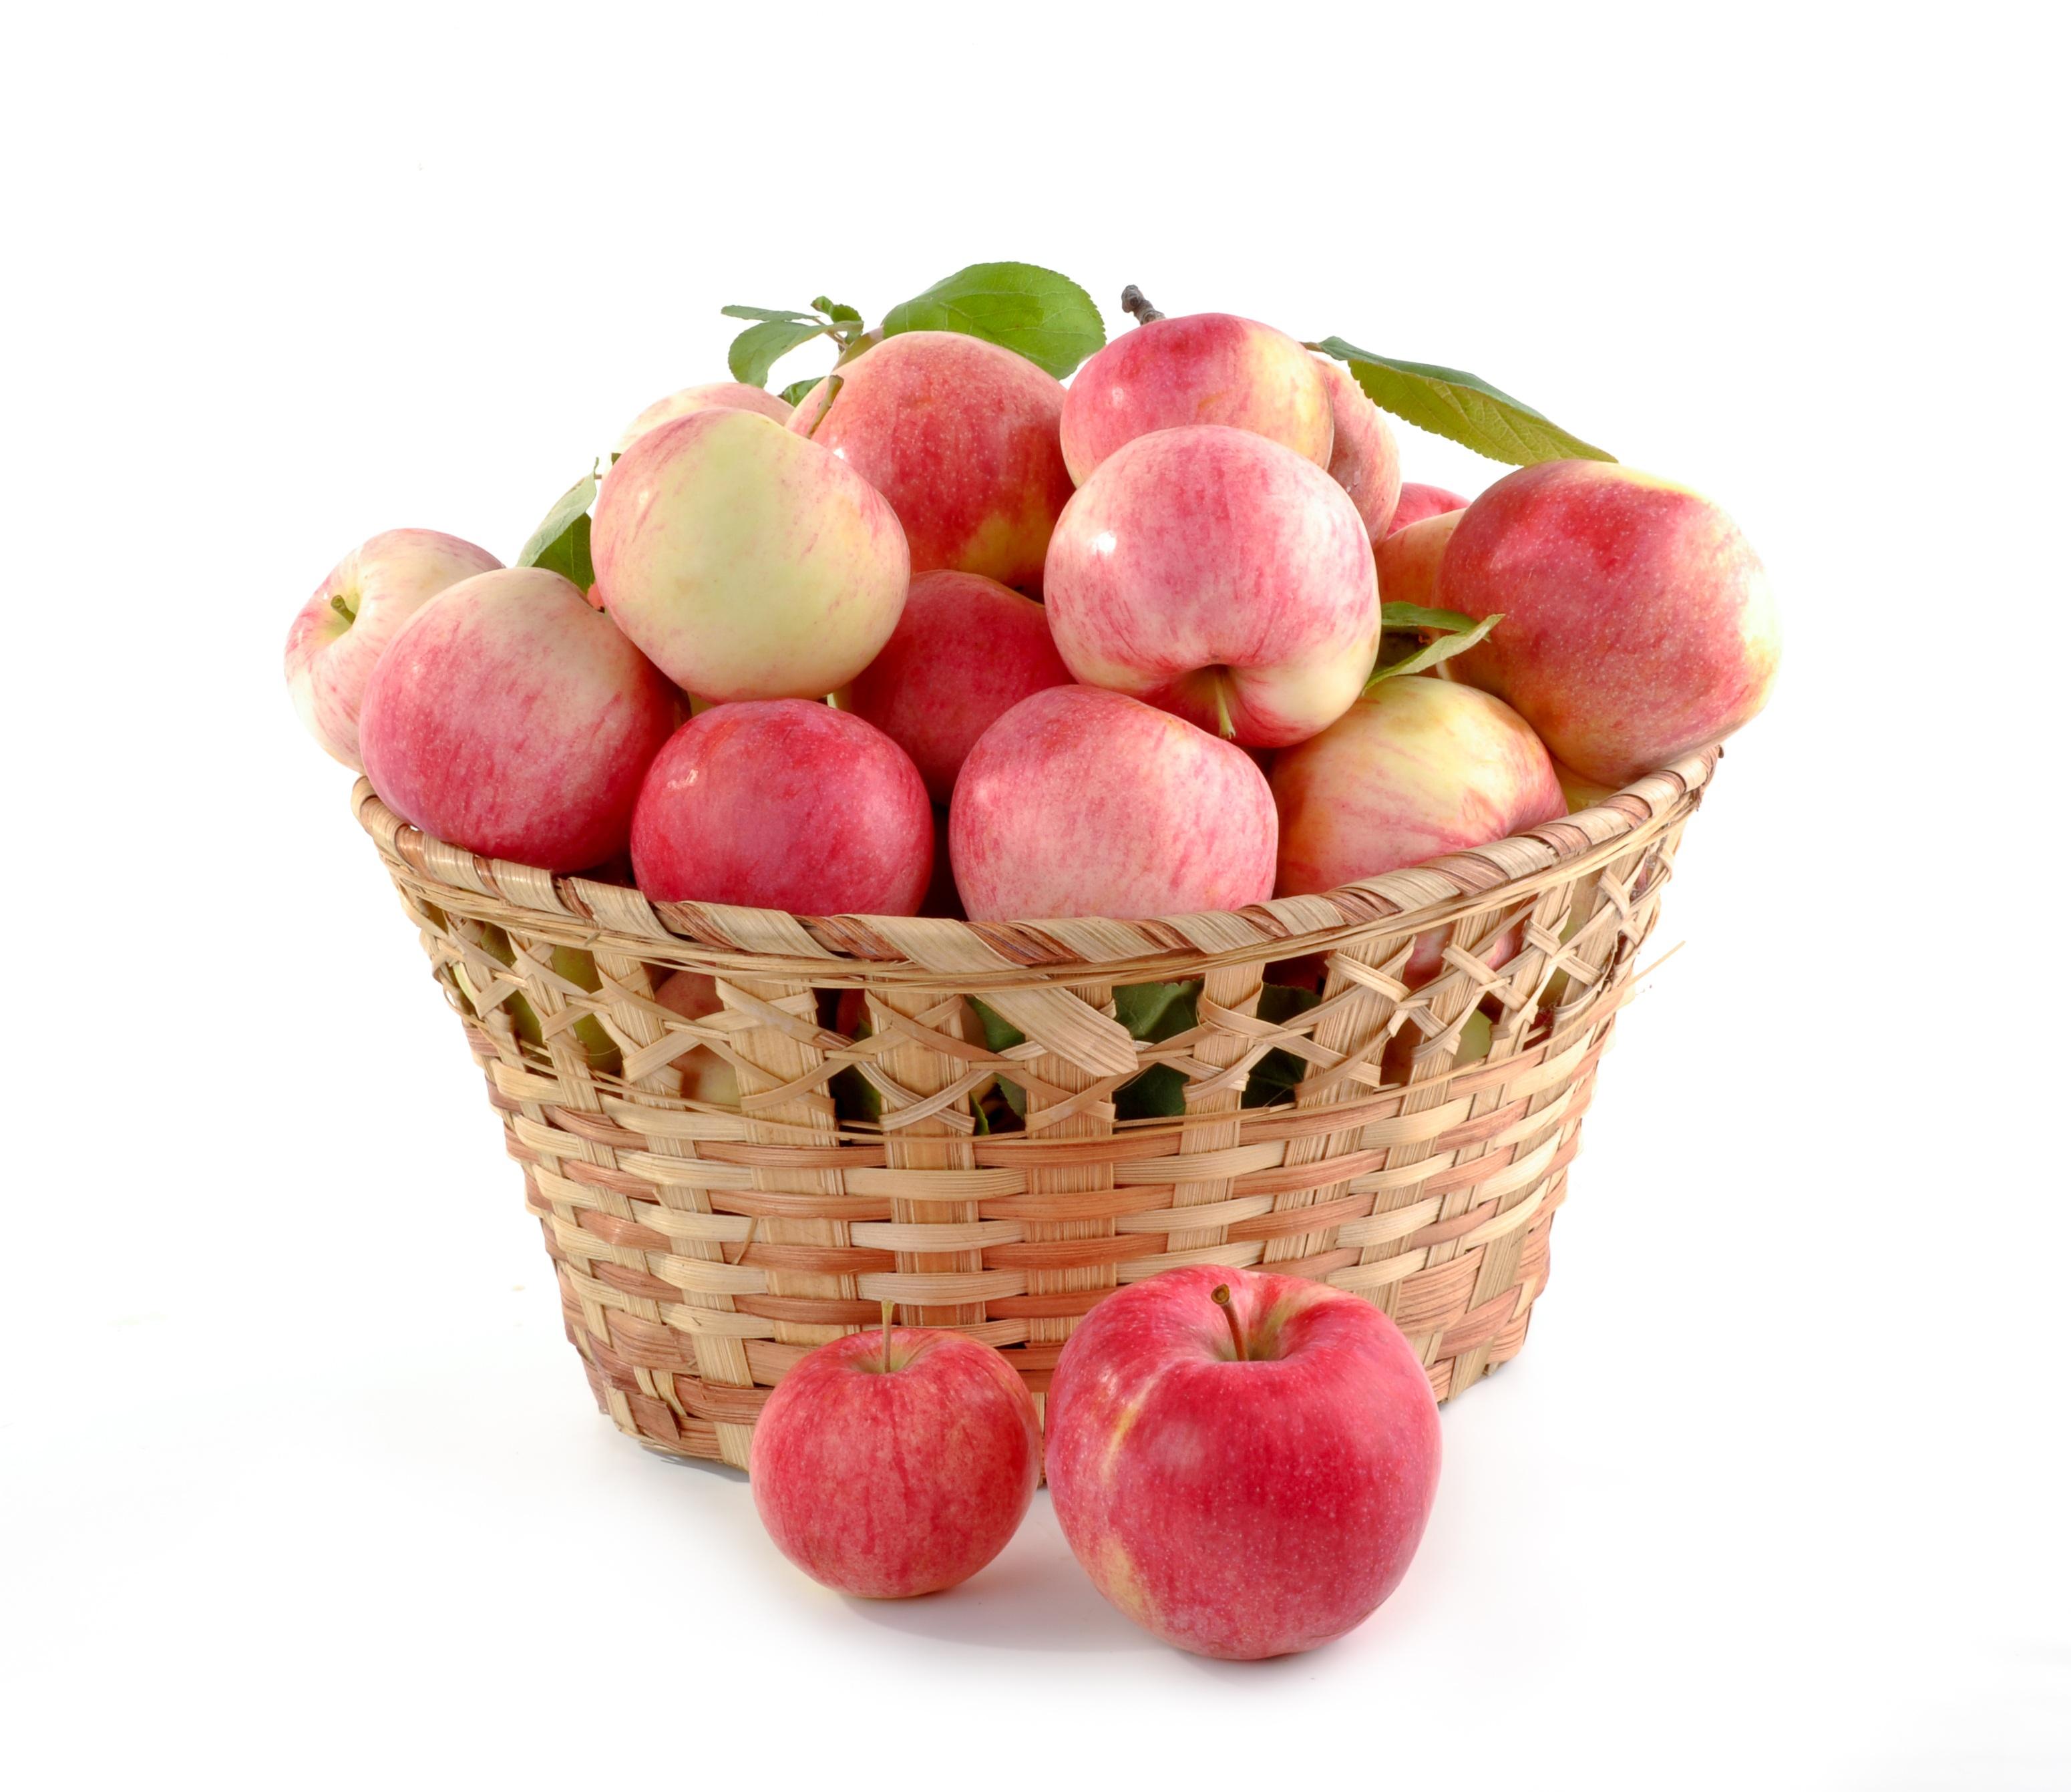 apples-805124